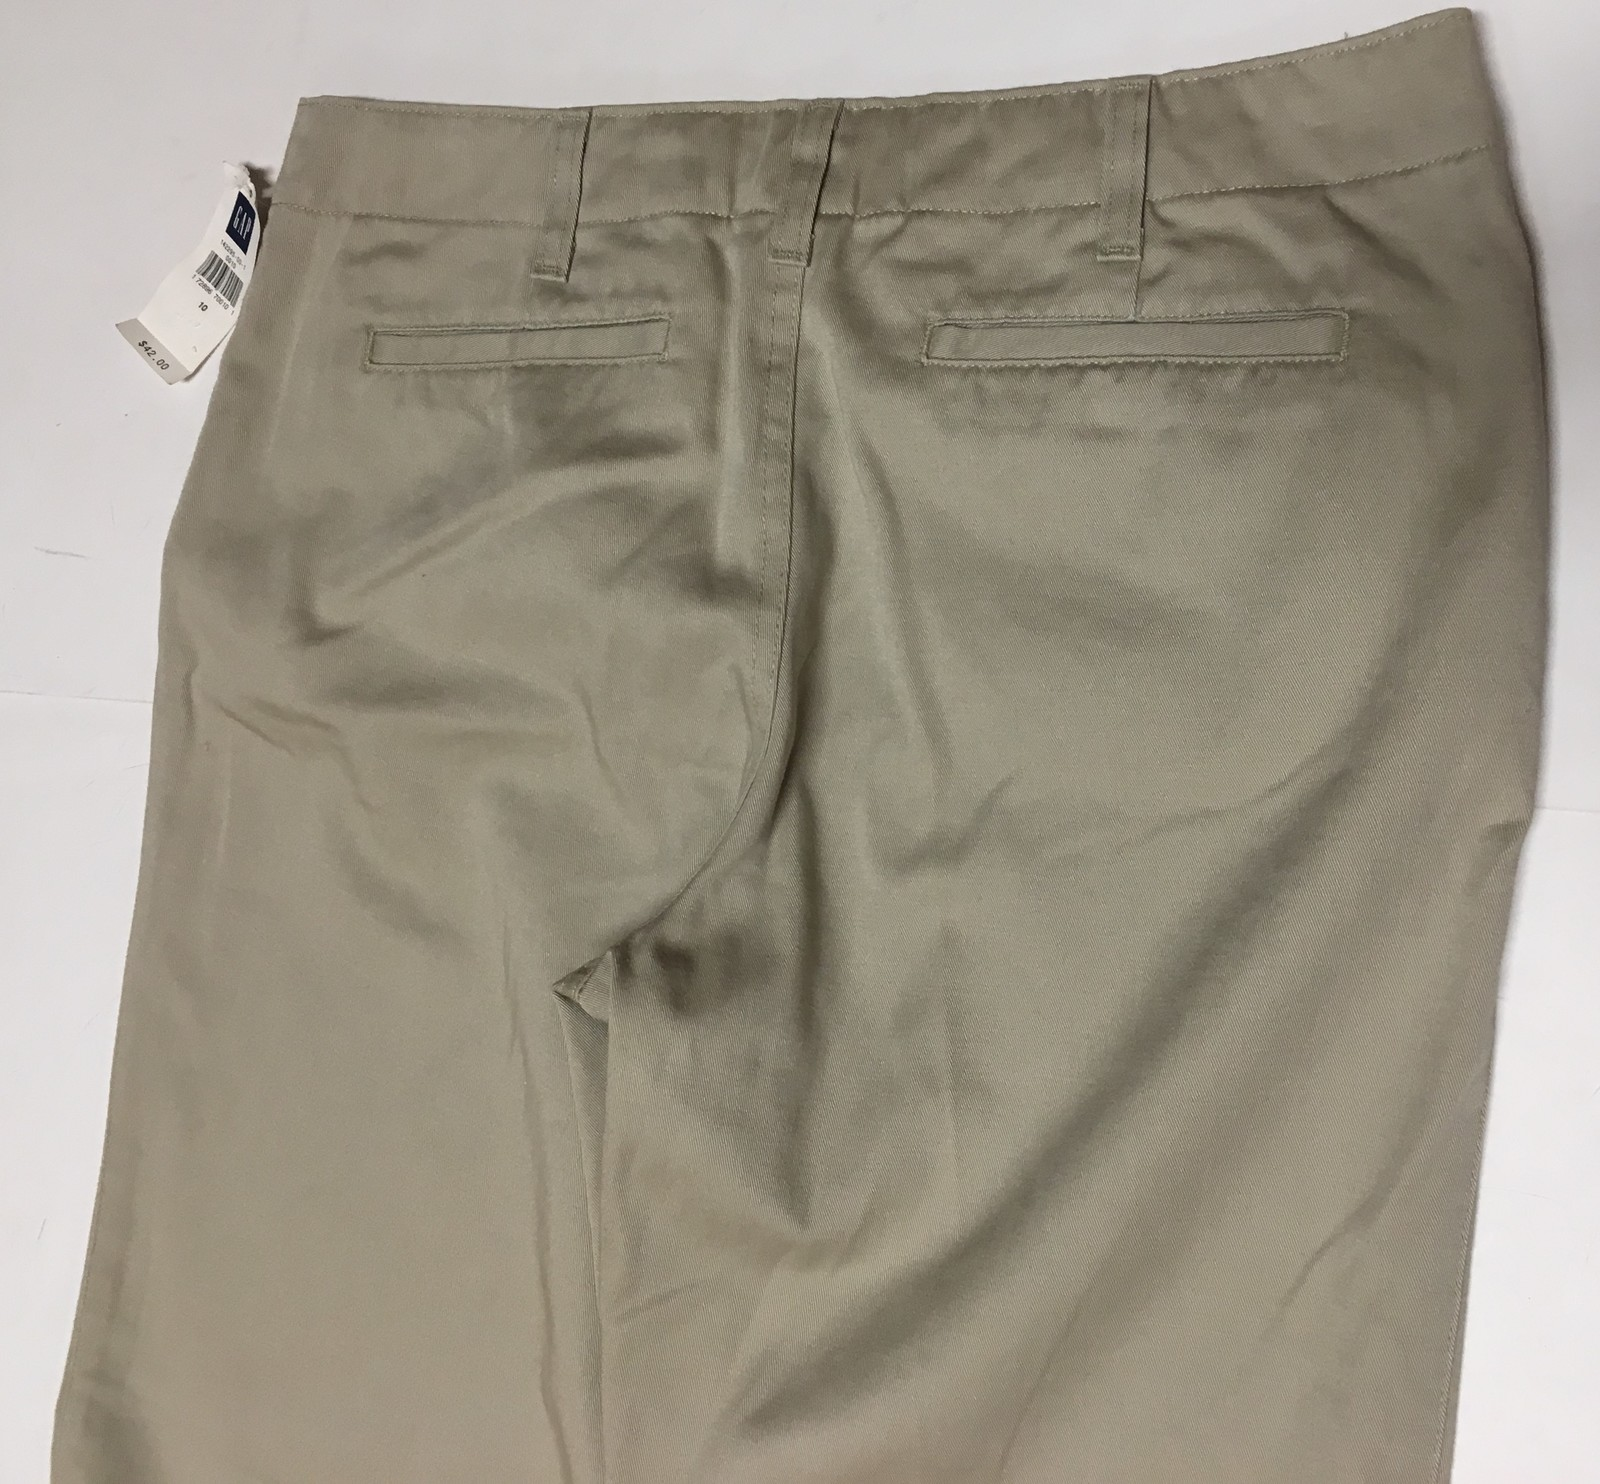 GAP Hipster Trousers Pants Beige Sz 10 image 4